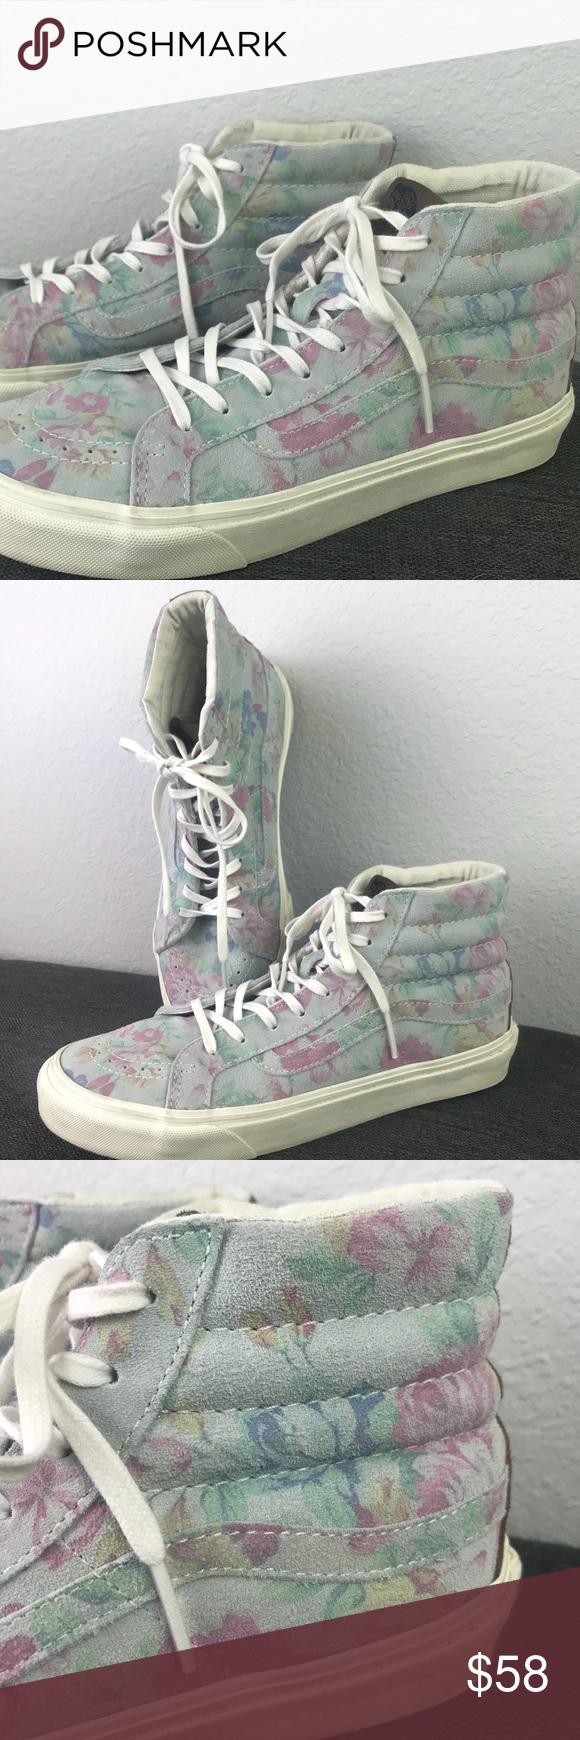 914b65c0f9 Vans Sk8-Hi Slim Sneaker Suede Floral Marshmallow